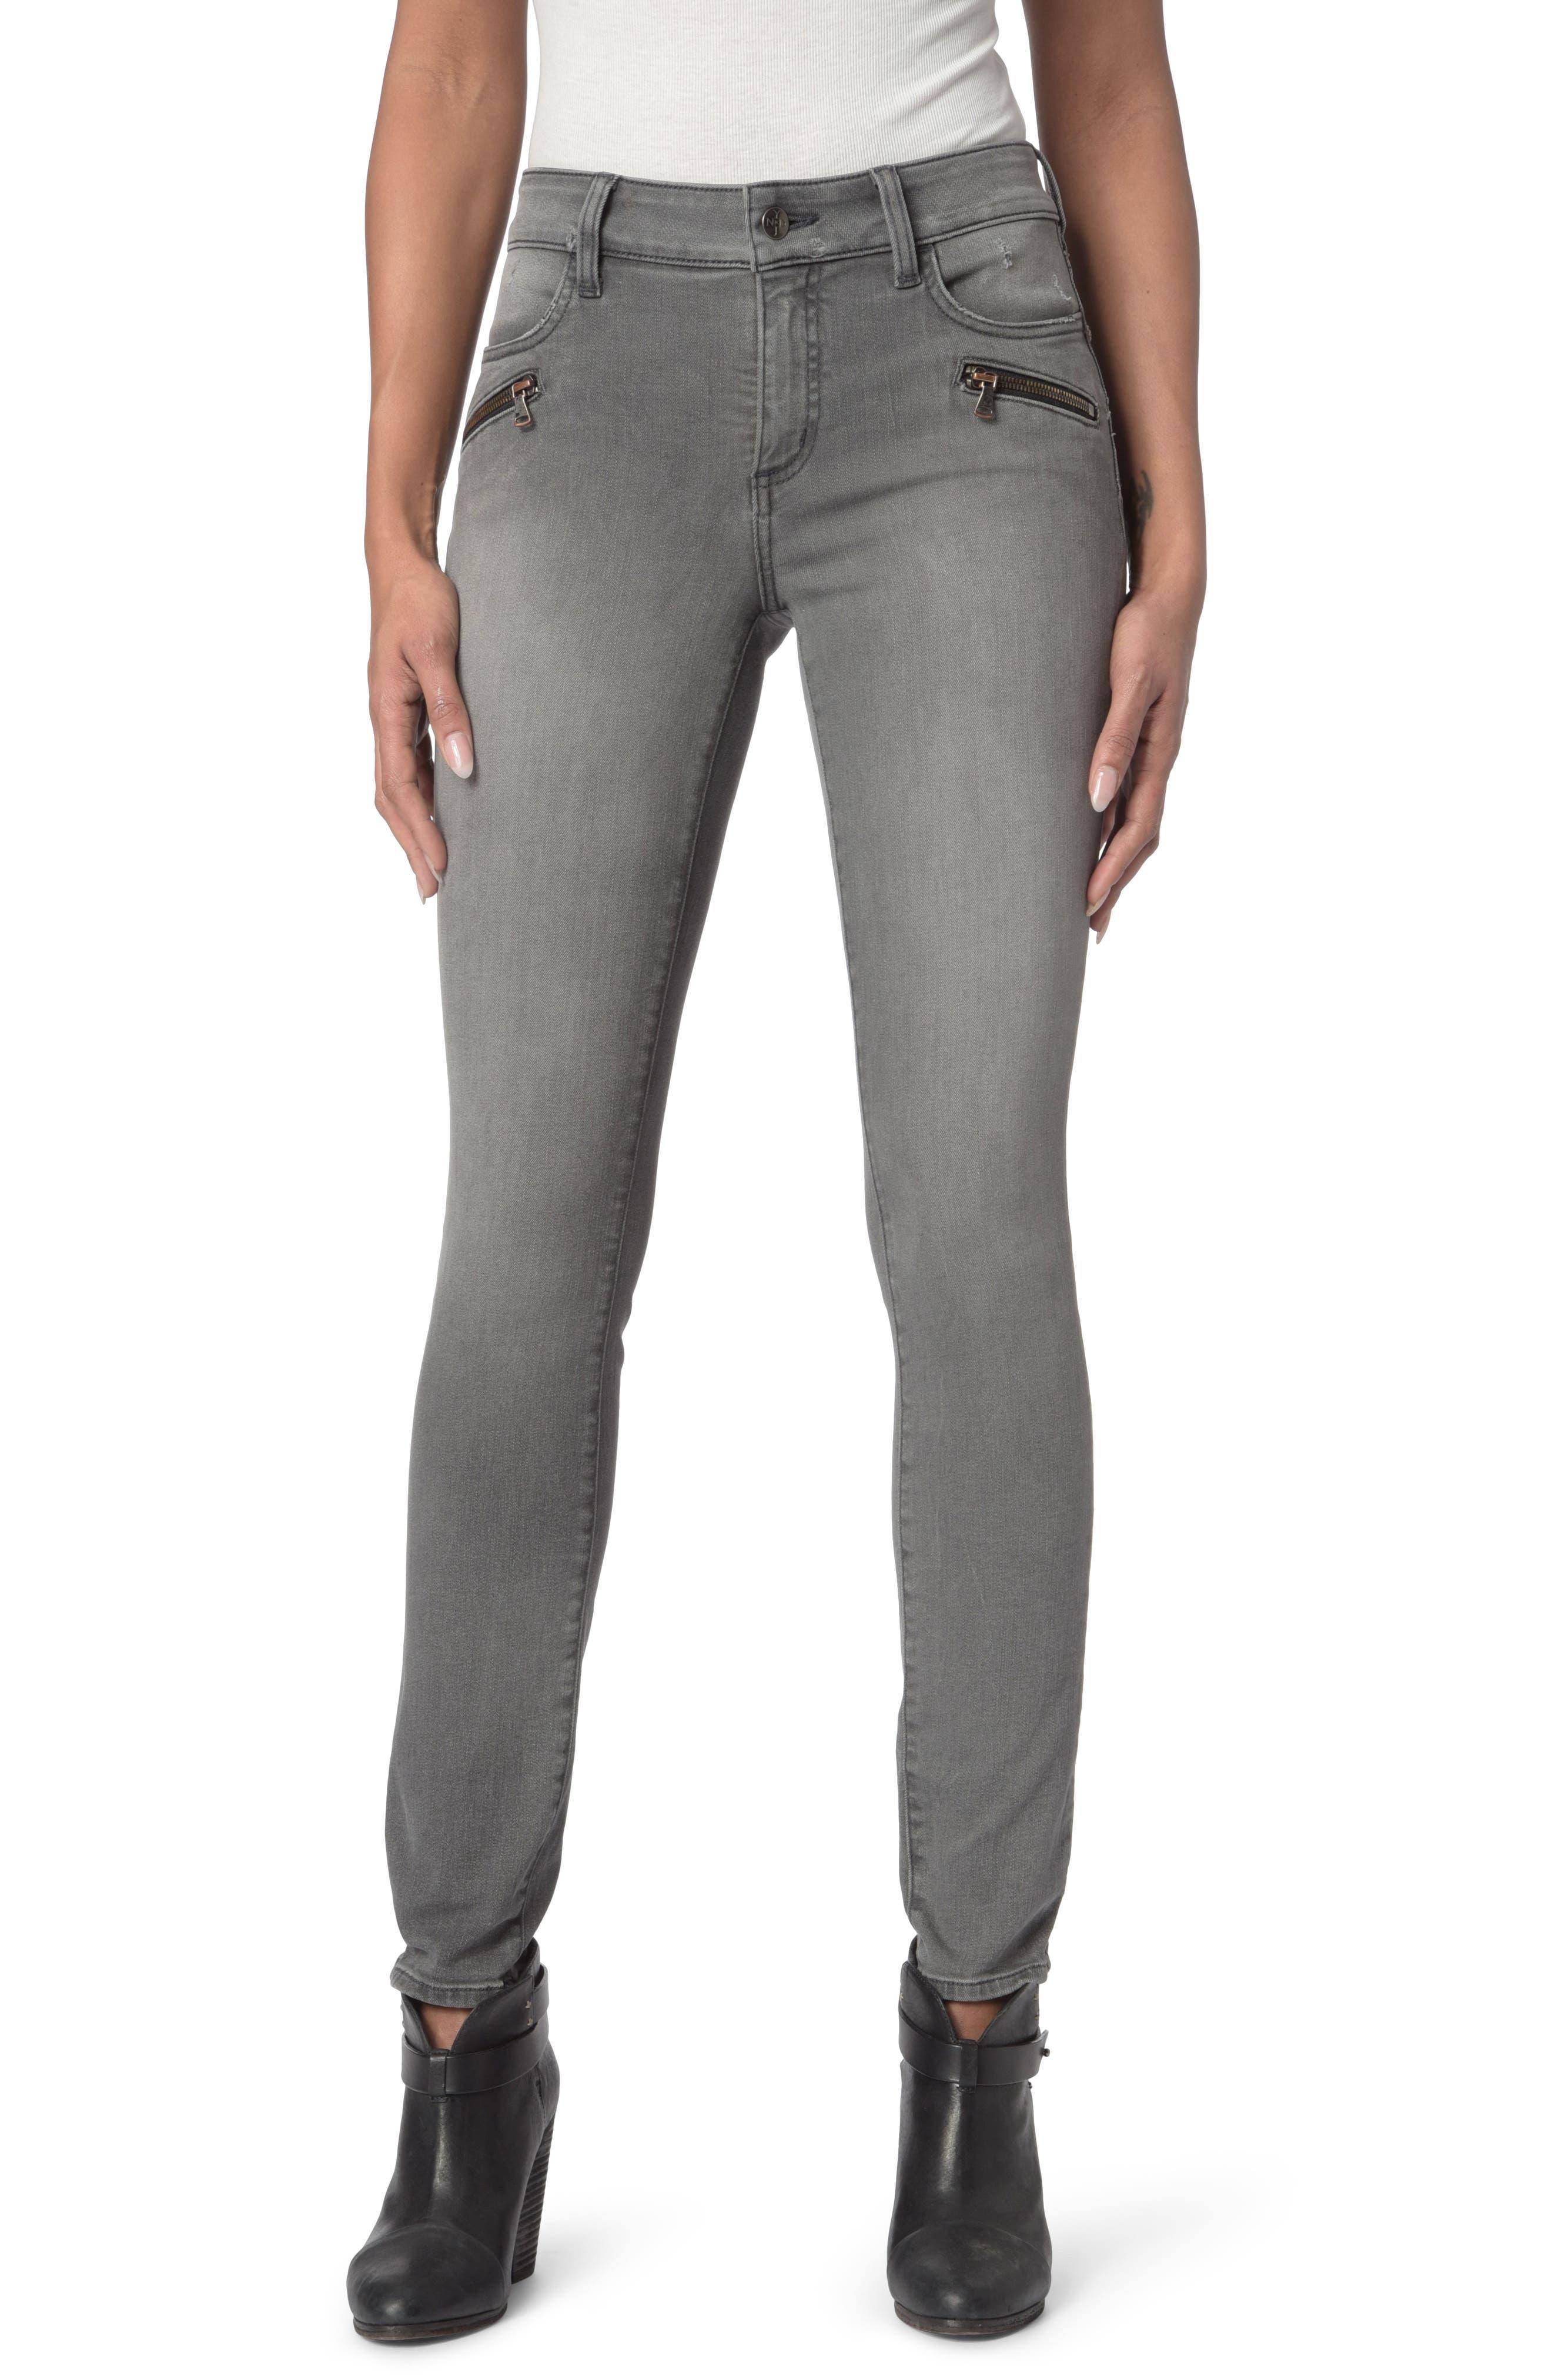 Main Image - NYDJ Alina Zippered Legging Jeans (Alchemy)